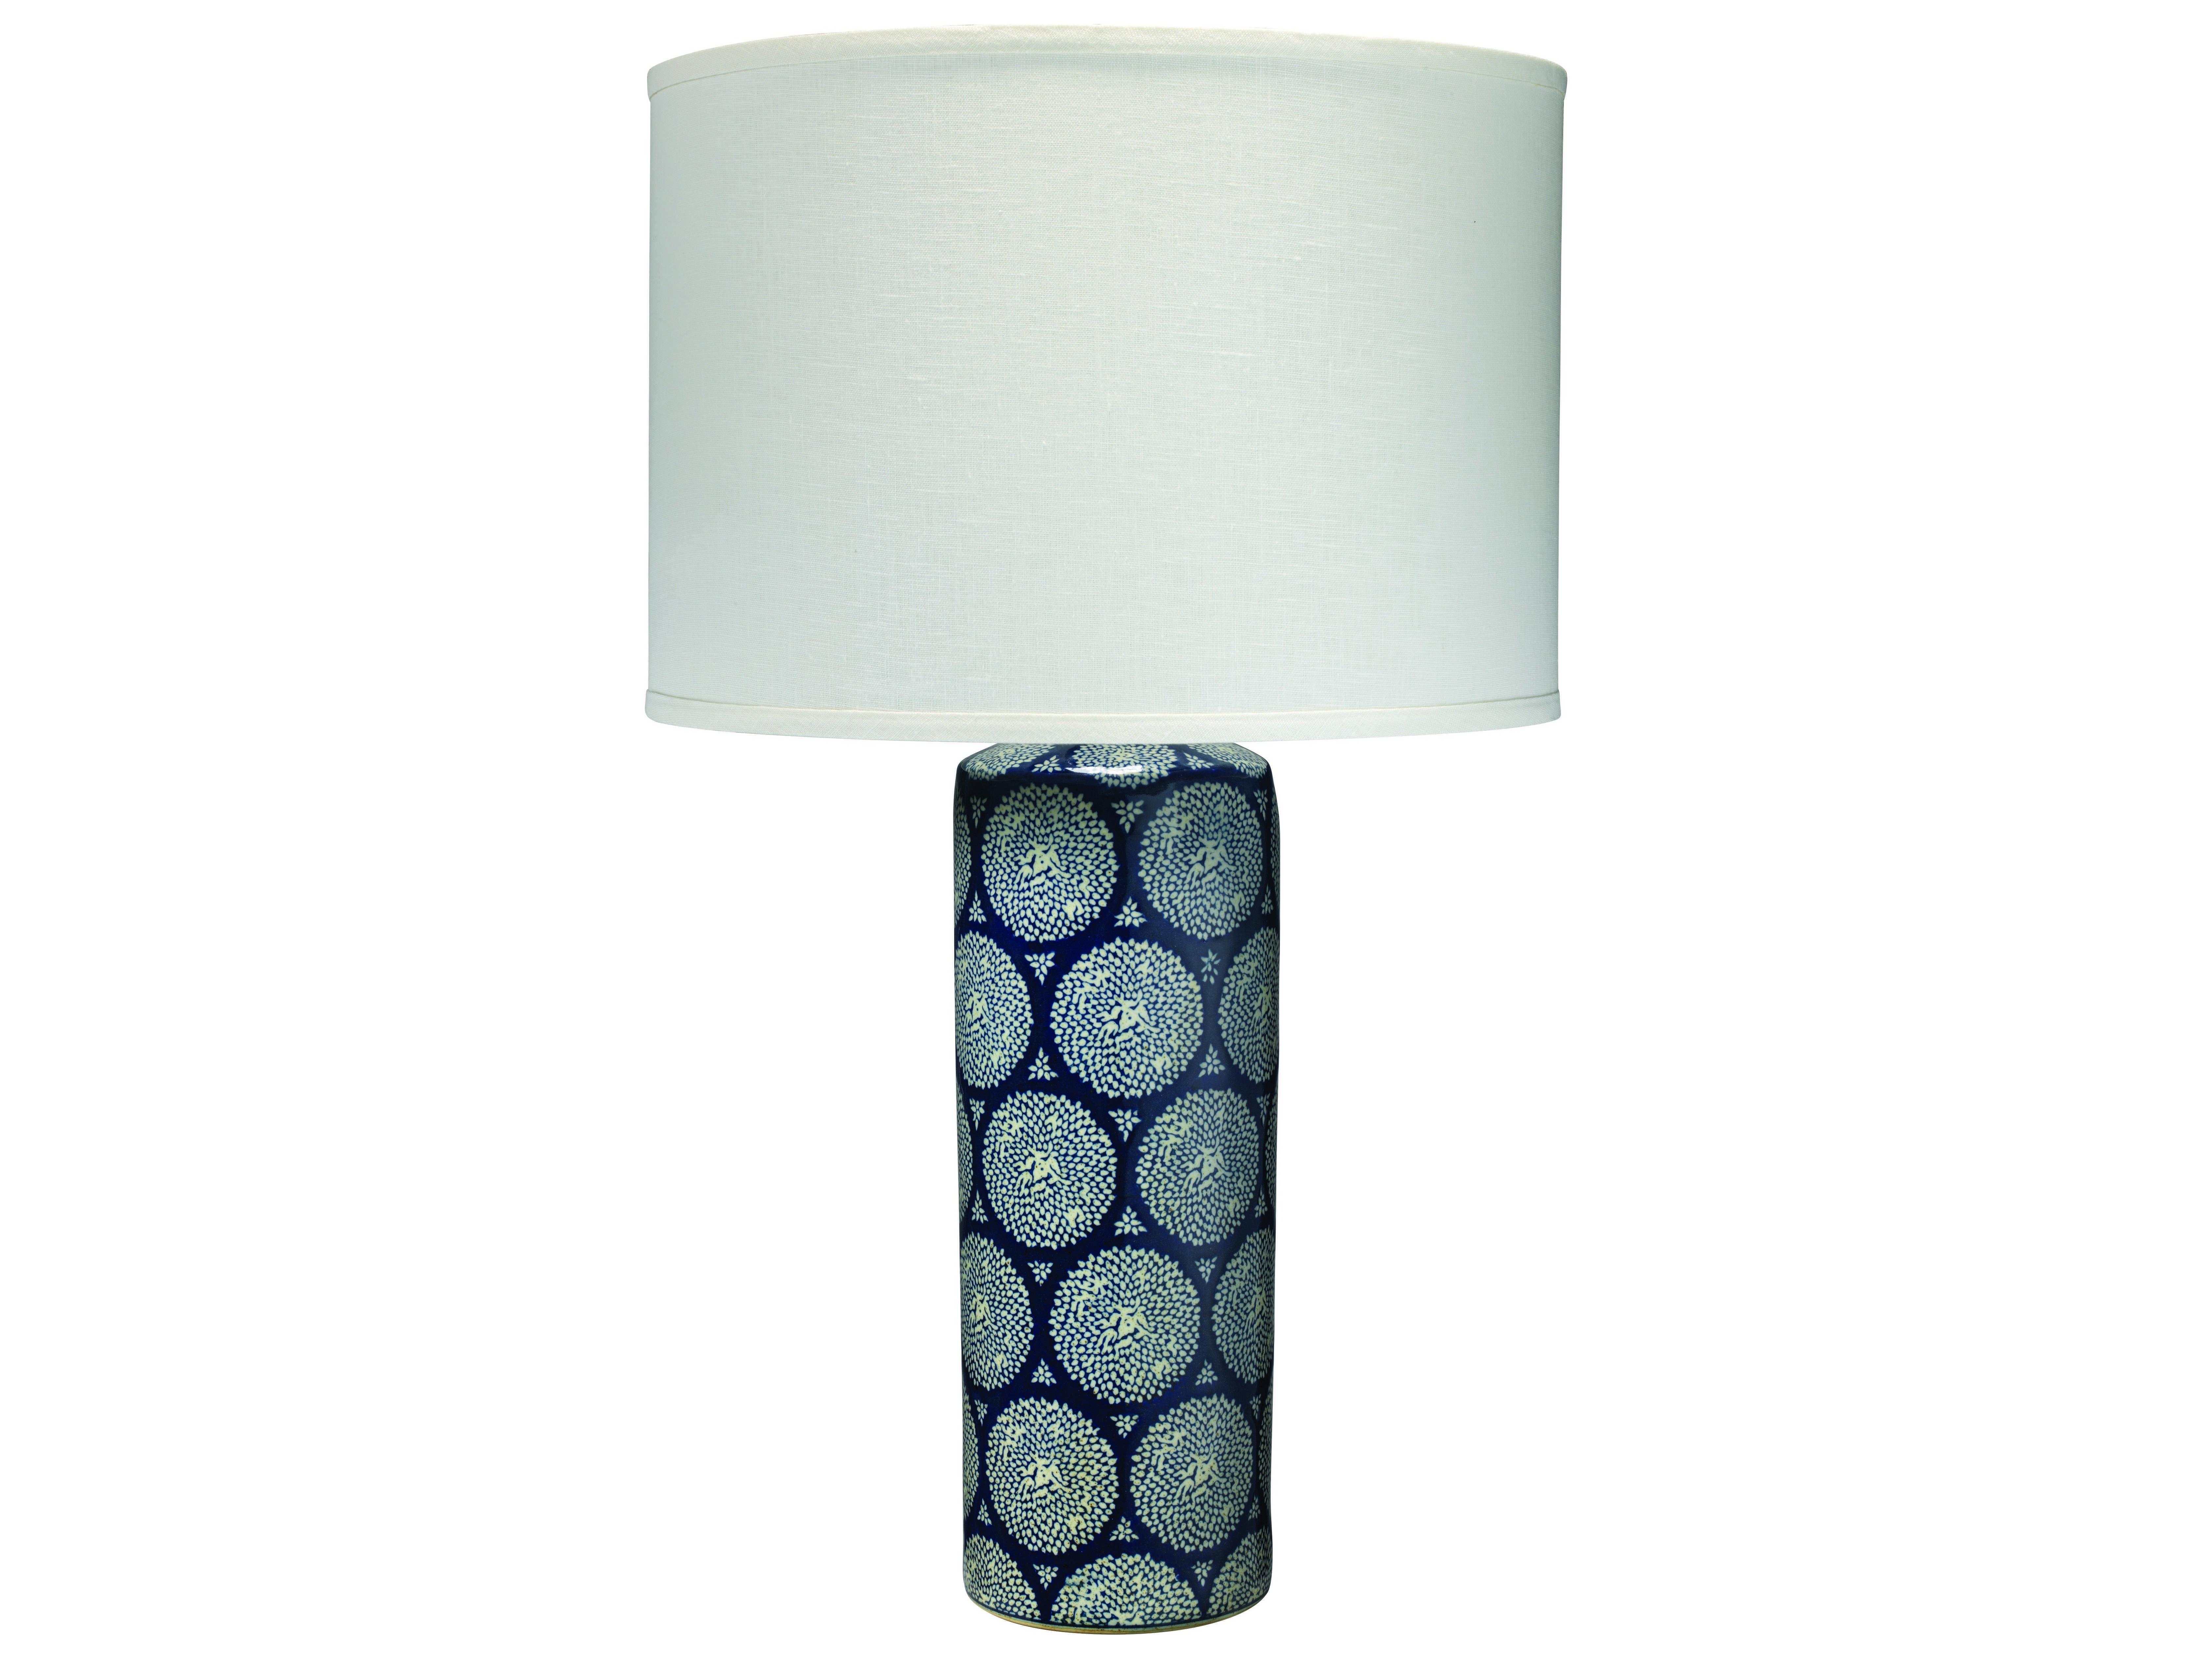 Jamie Young Company Neva Blue White Table Lamp